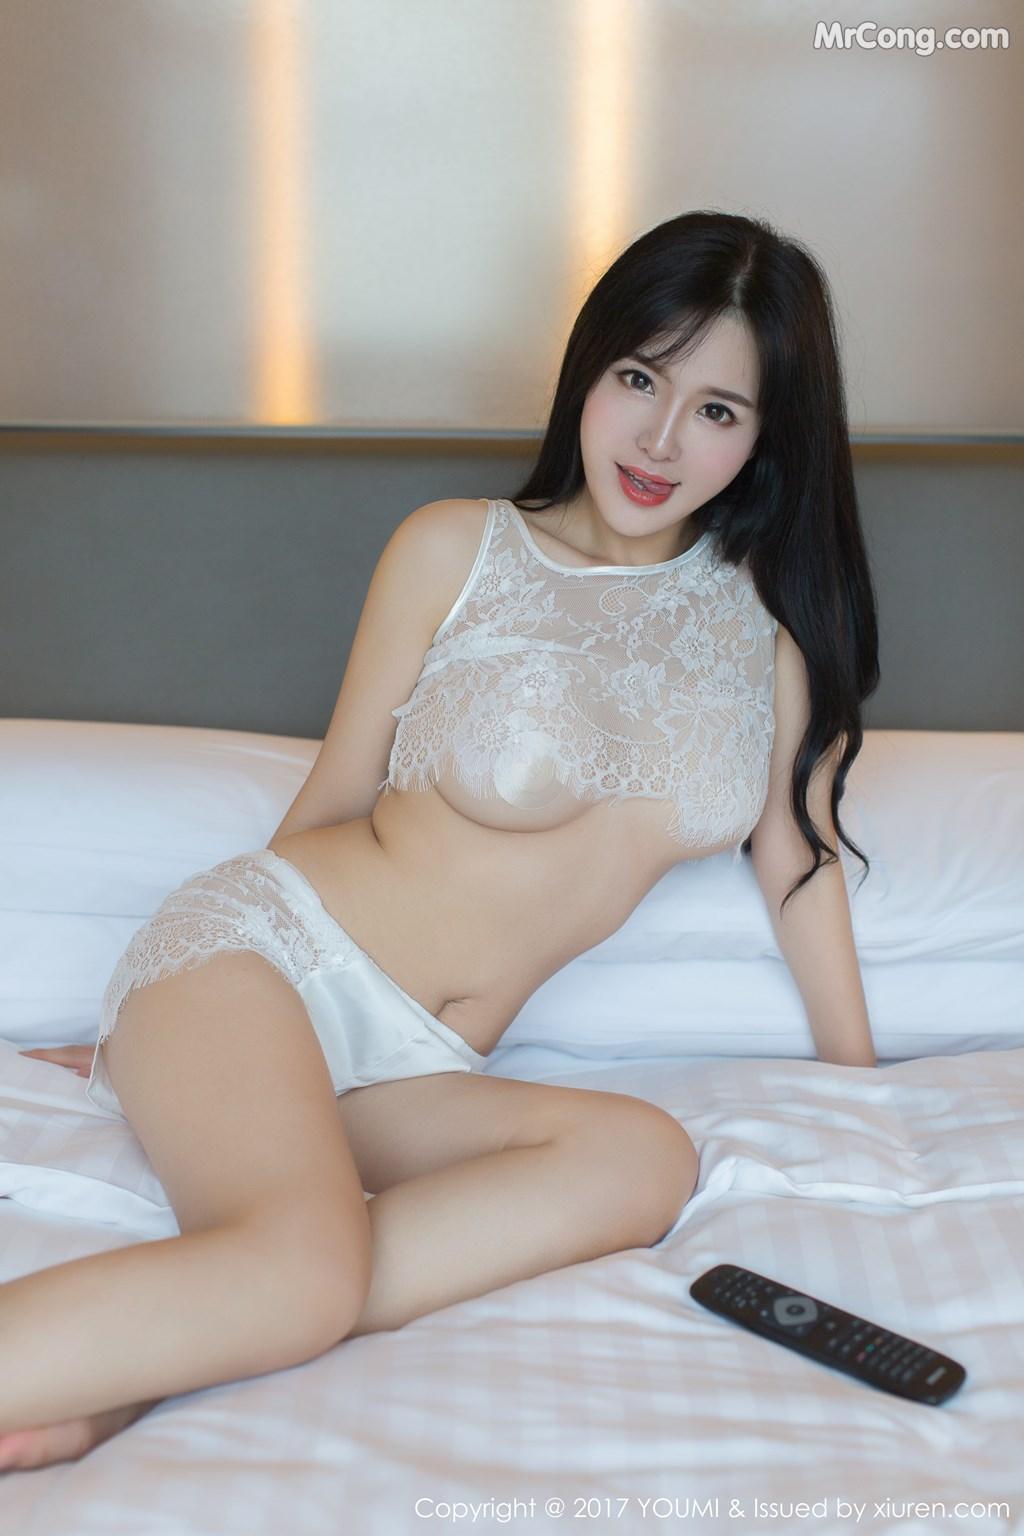 YouMi Vol.131: Model Liu Yu Er (刘 钰 儿) (41 photos)